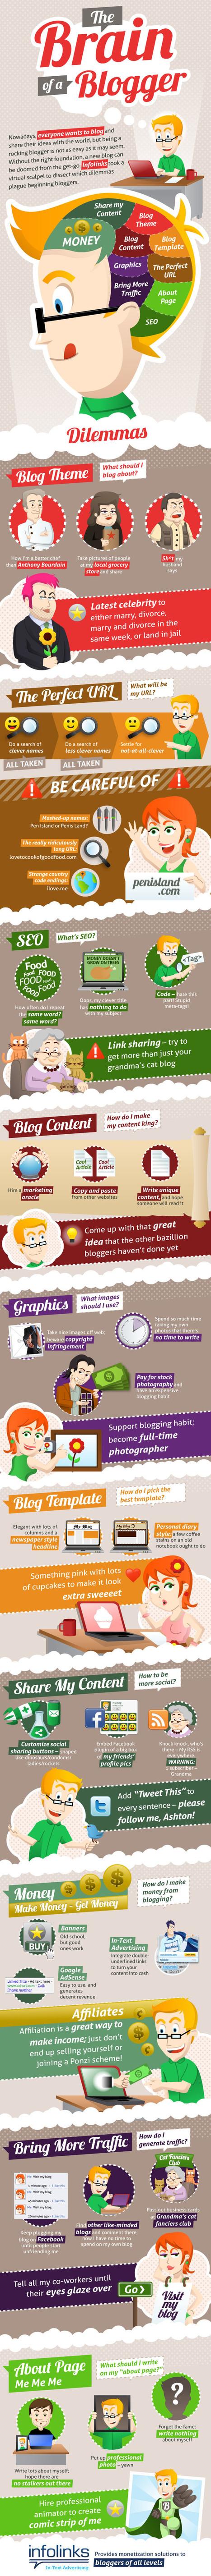 The Brain of a Blogger.jpg (600x7341 pixels) | Blogging | Scoop.it